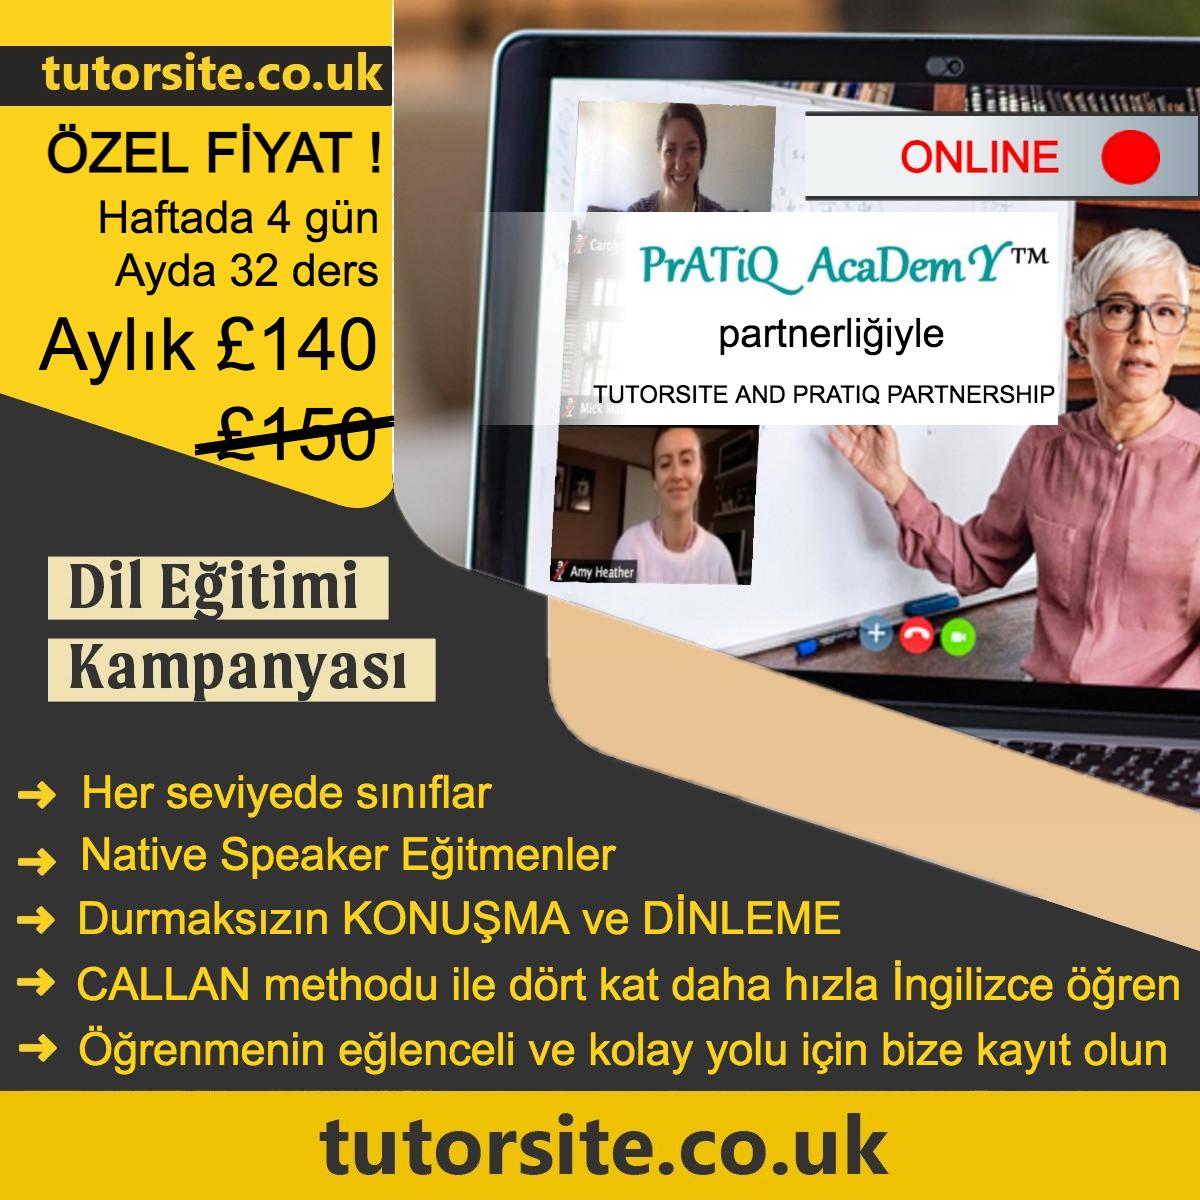 tutorsite-banner-callan-26.png